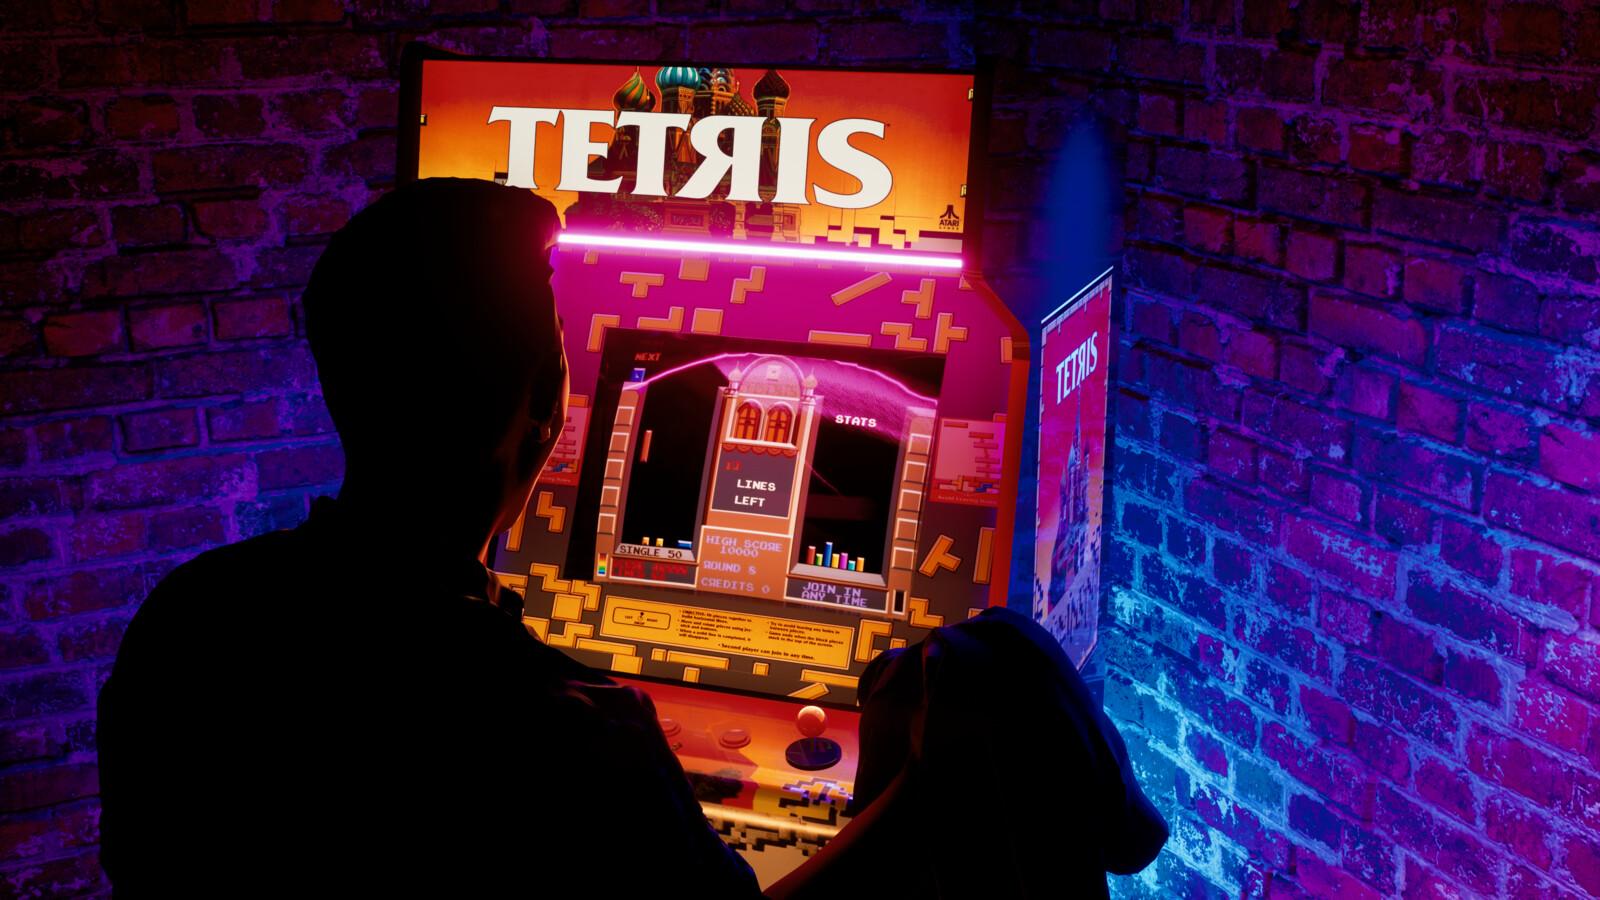 Tetris Arcade Gaming